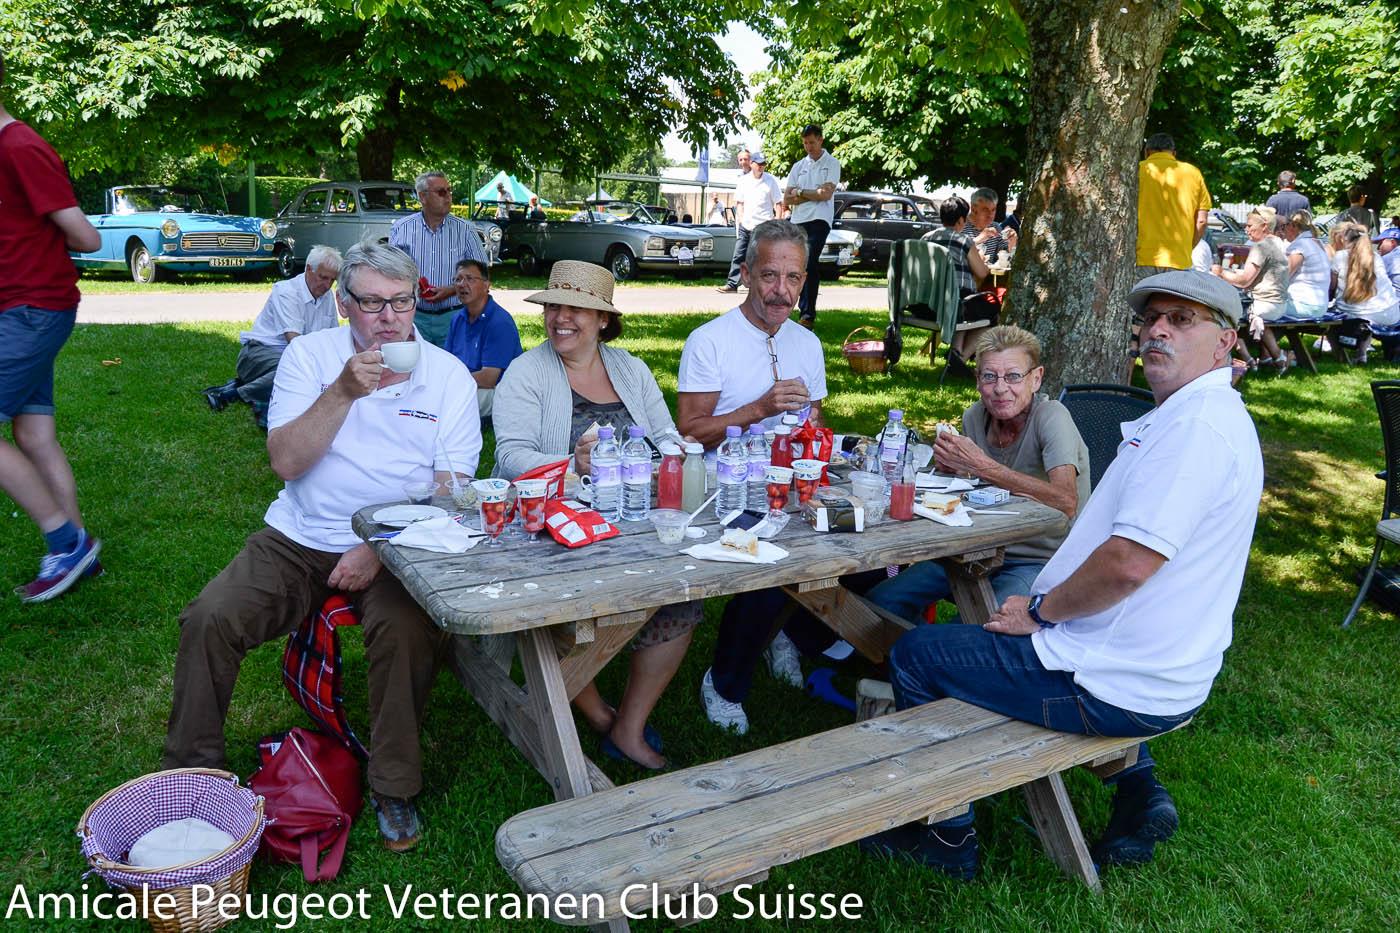 Internationales Peugeot Veteranen Treffen in England, Juni 2014 (Bild Lechner)